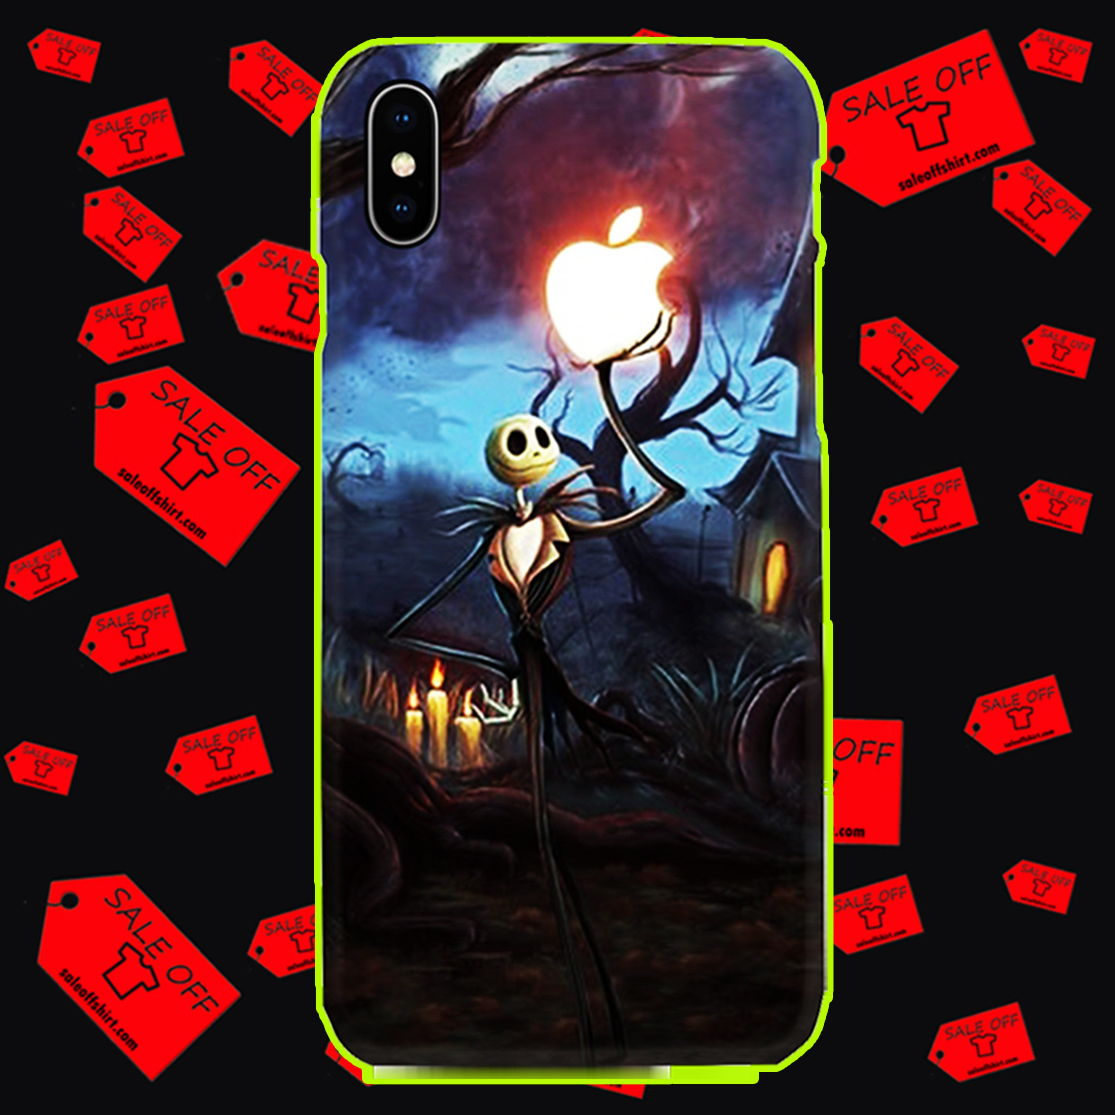 Jack Skellington Apple phone case - iphone X case